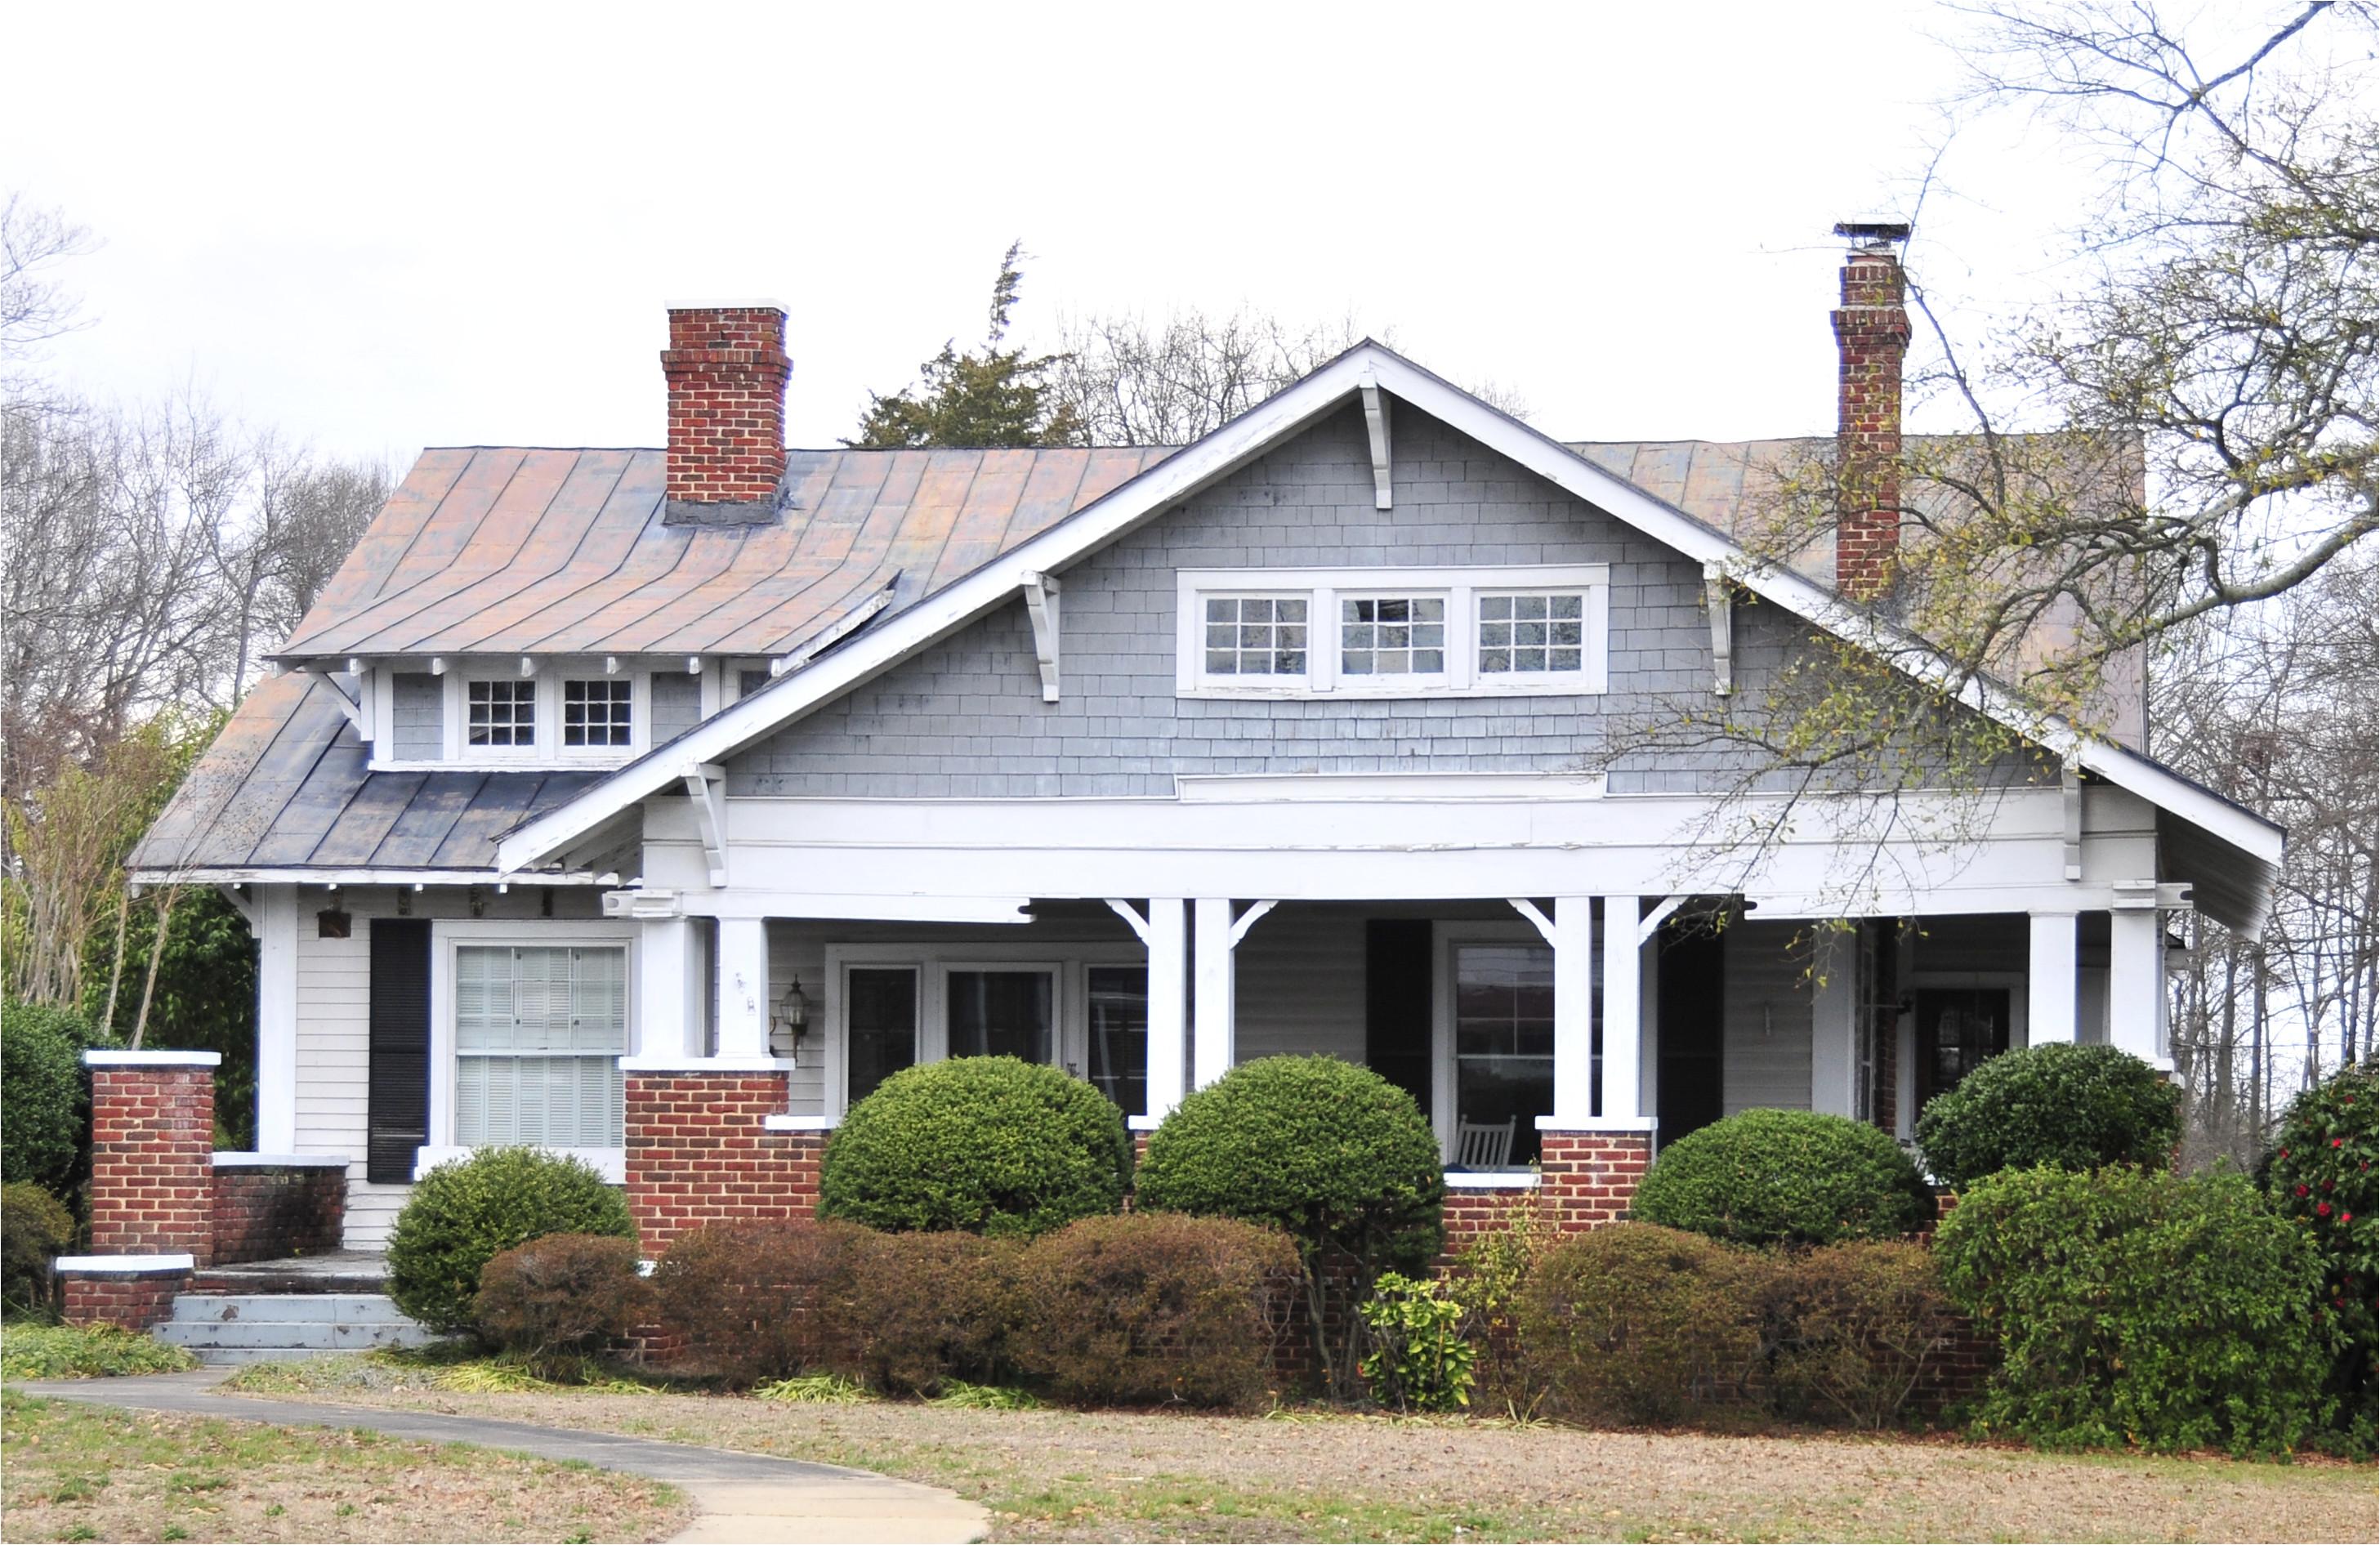 mcdowell house historic jpg